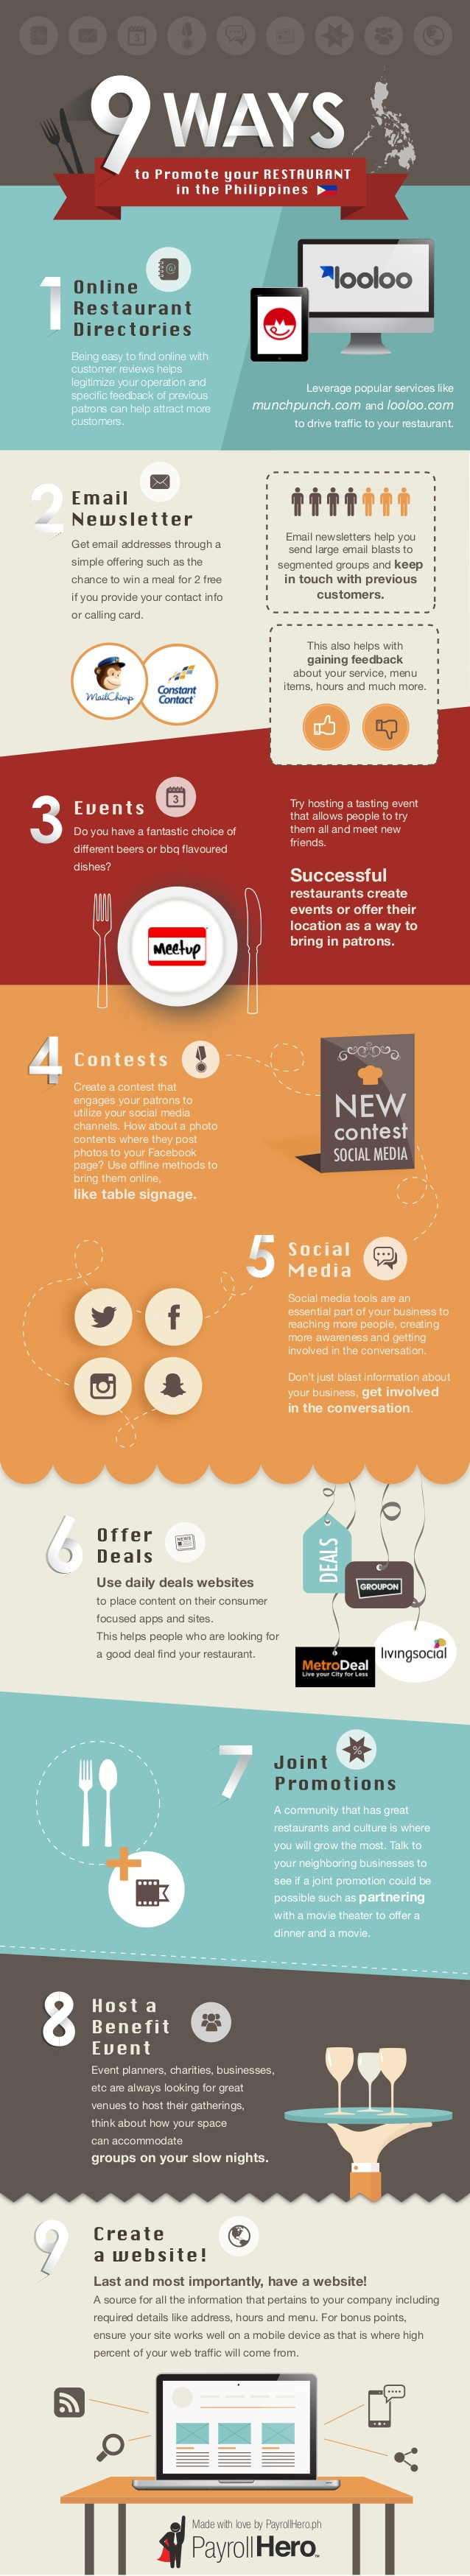 infografia_9_maneras_de_promocionar_un_restaurante